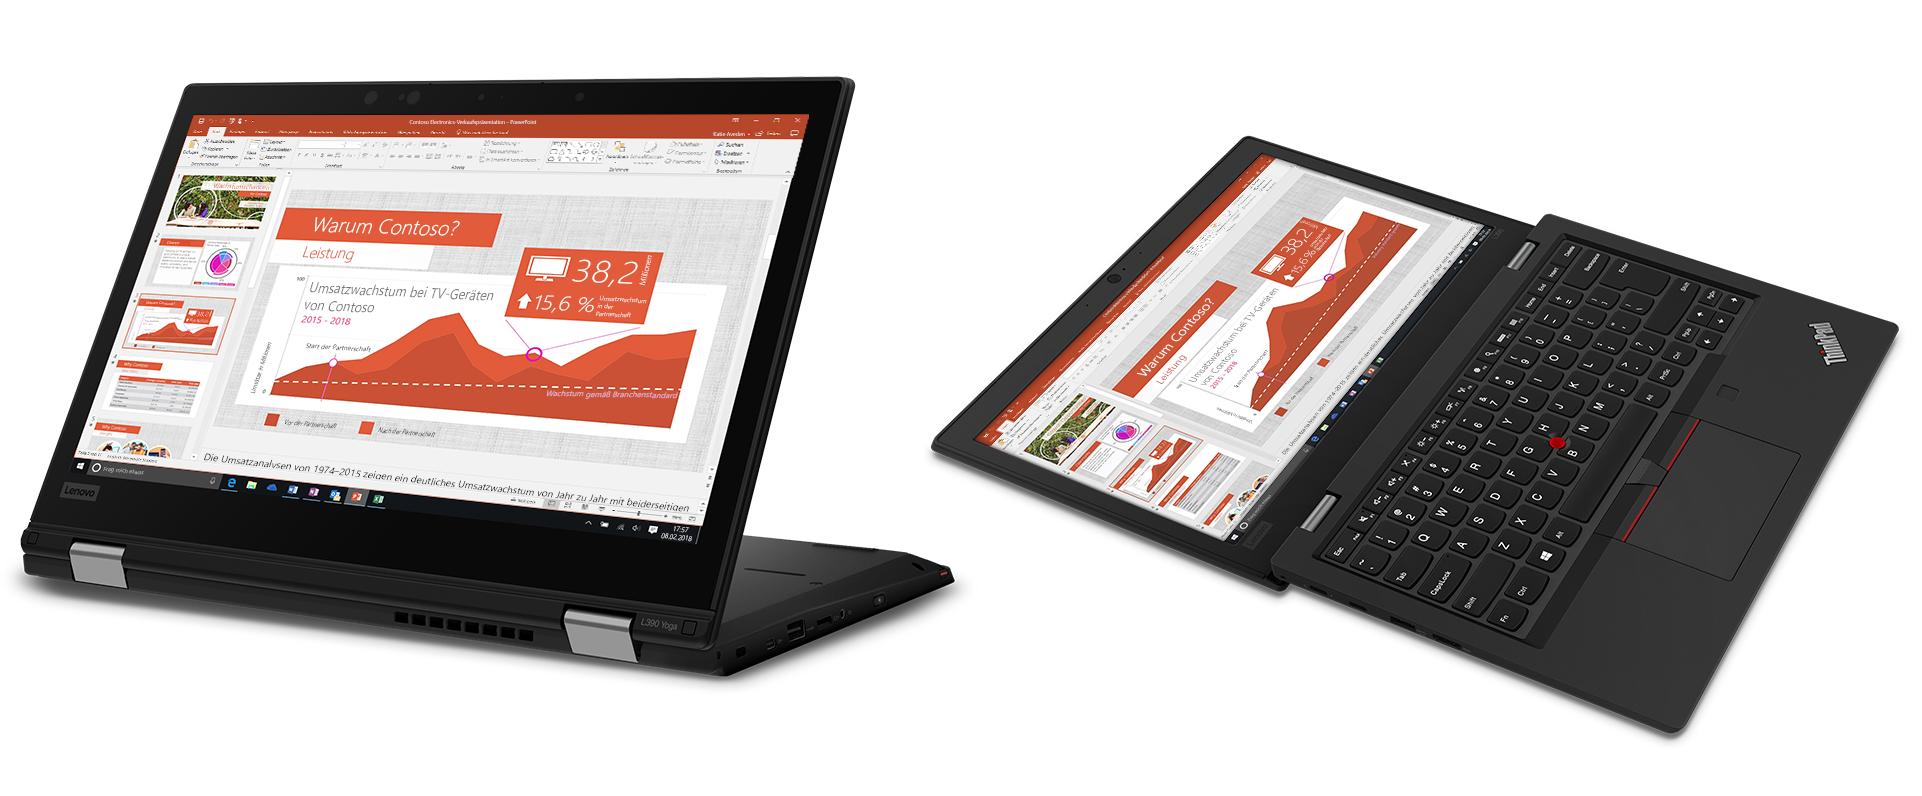 Abbildung des Lenovo ThinkPad L390 und L390 Yoga